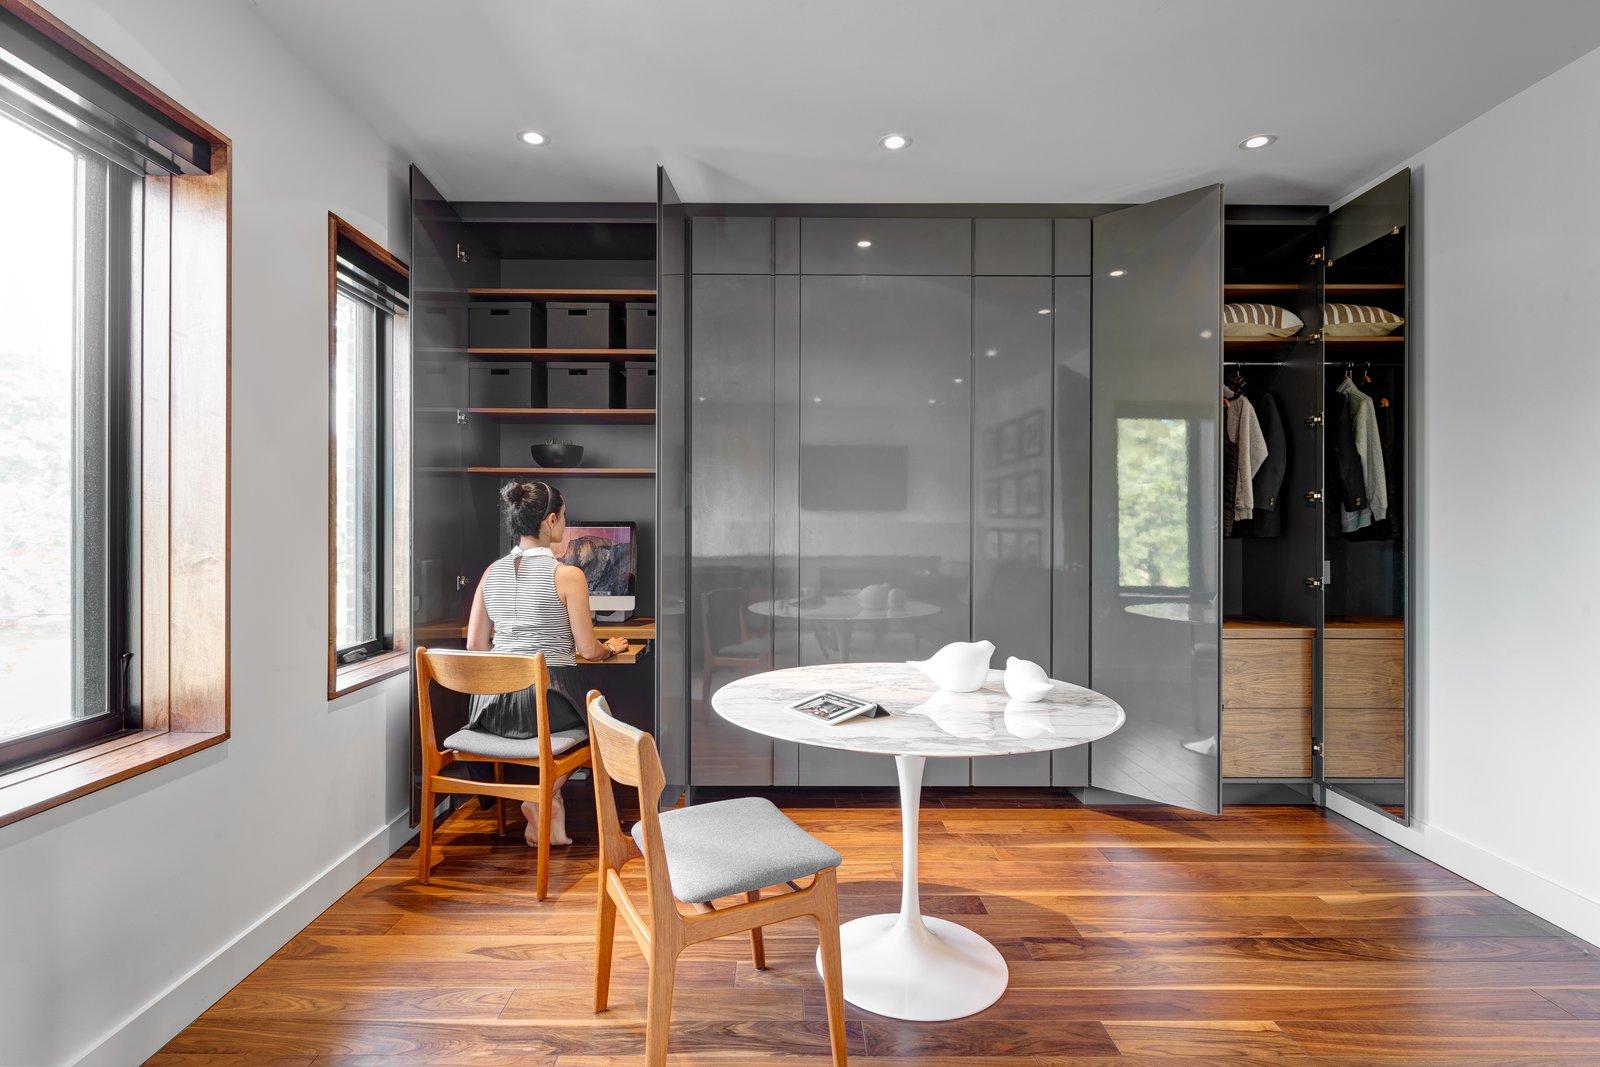 Riverdale Dormer House by Sanam Samanian